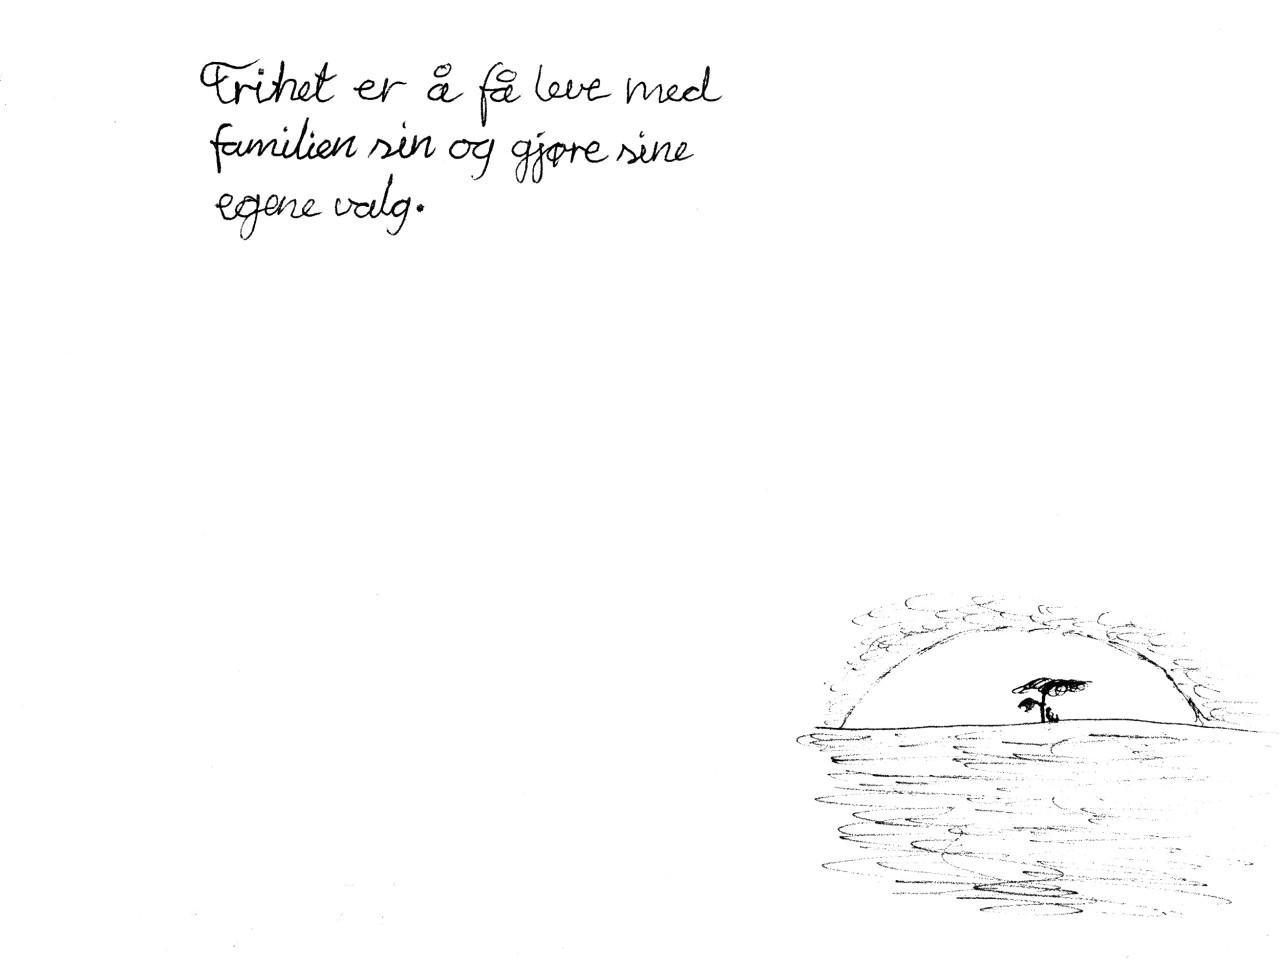 Gard Berg Hatlestad's definition of freedom - Tracing Freedom